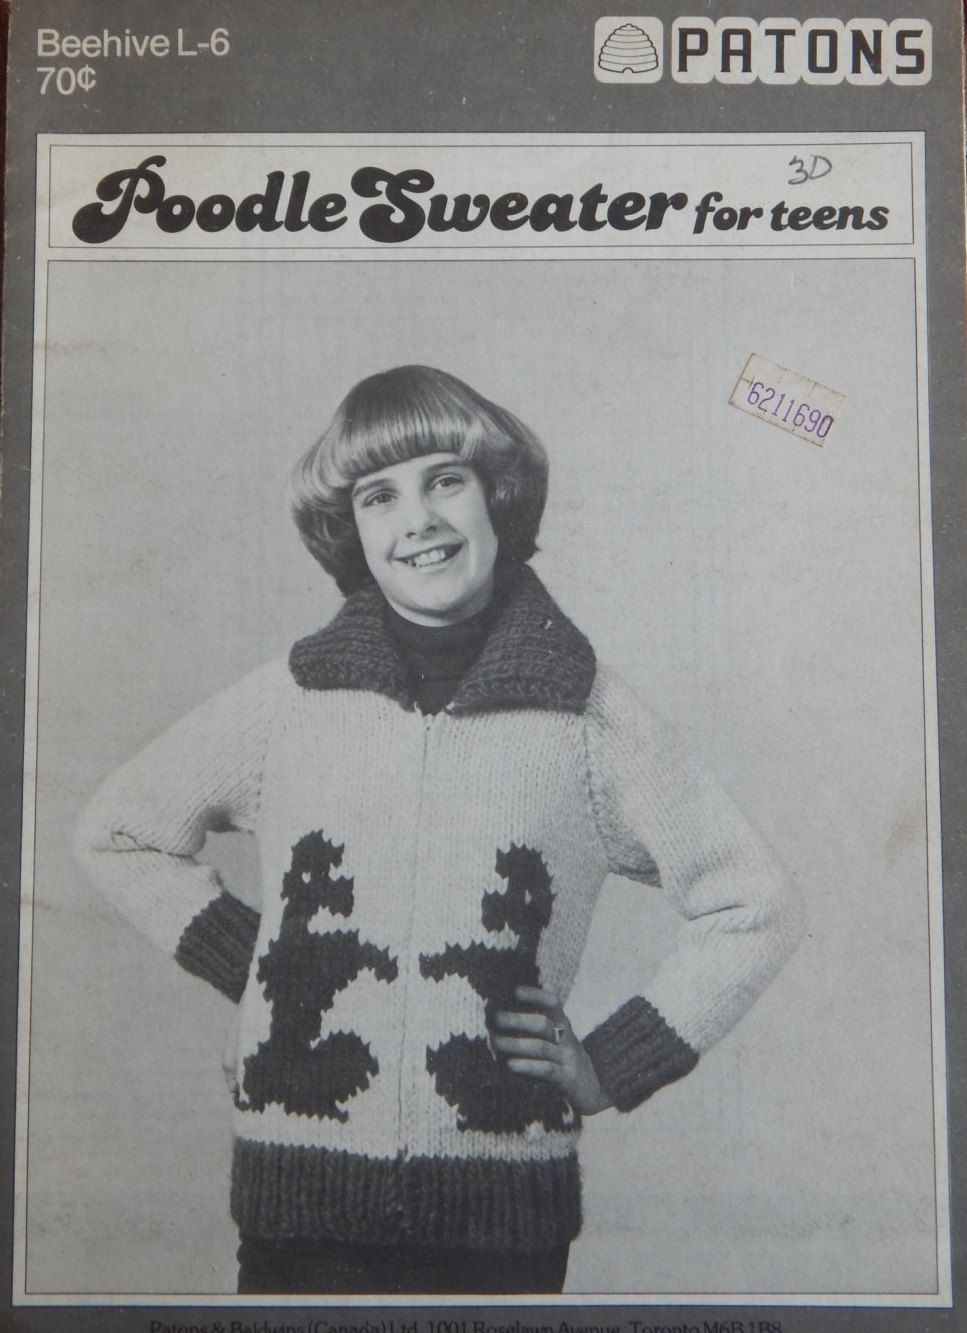 Cardigan sweater knitting pattern shawl collar zipper front cardigan sweater knitting pattern shawl collar zipper front patons poodle sweater for teens bankloansurffo Choice Image